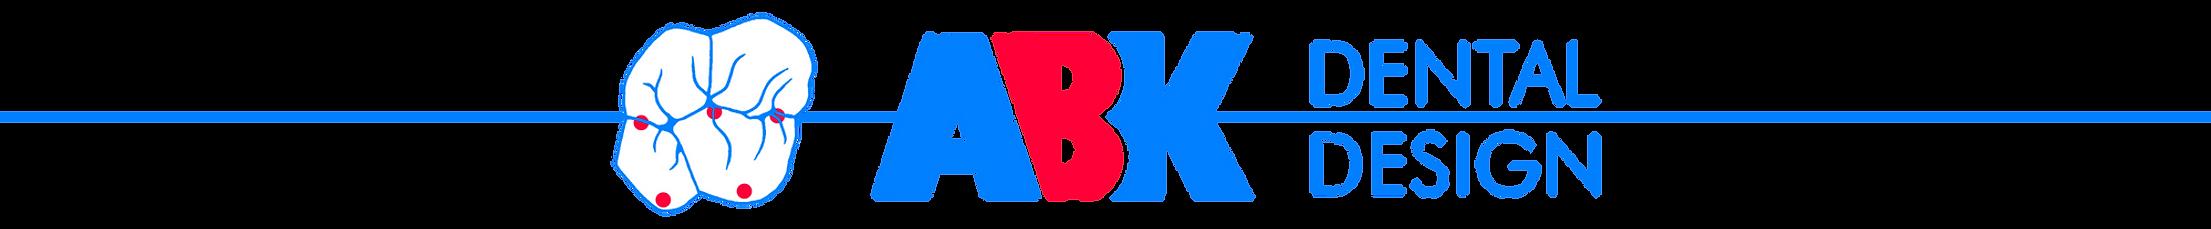 ABK_Bannerlogo_transparent_breit.png